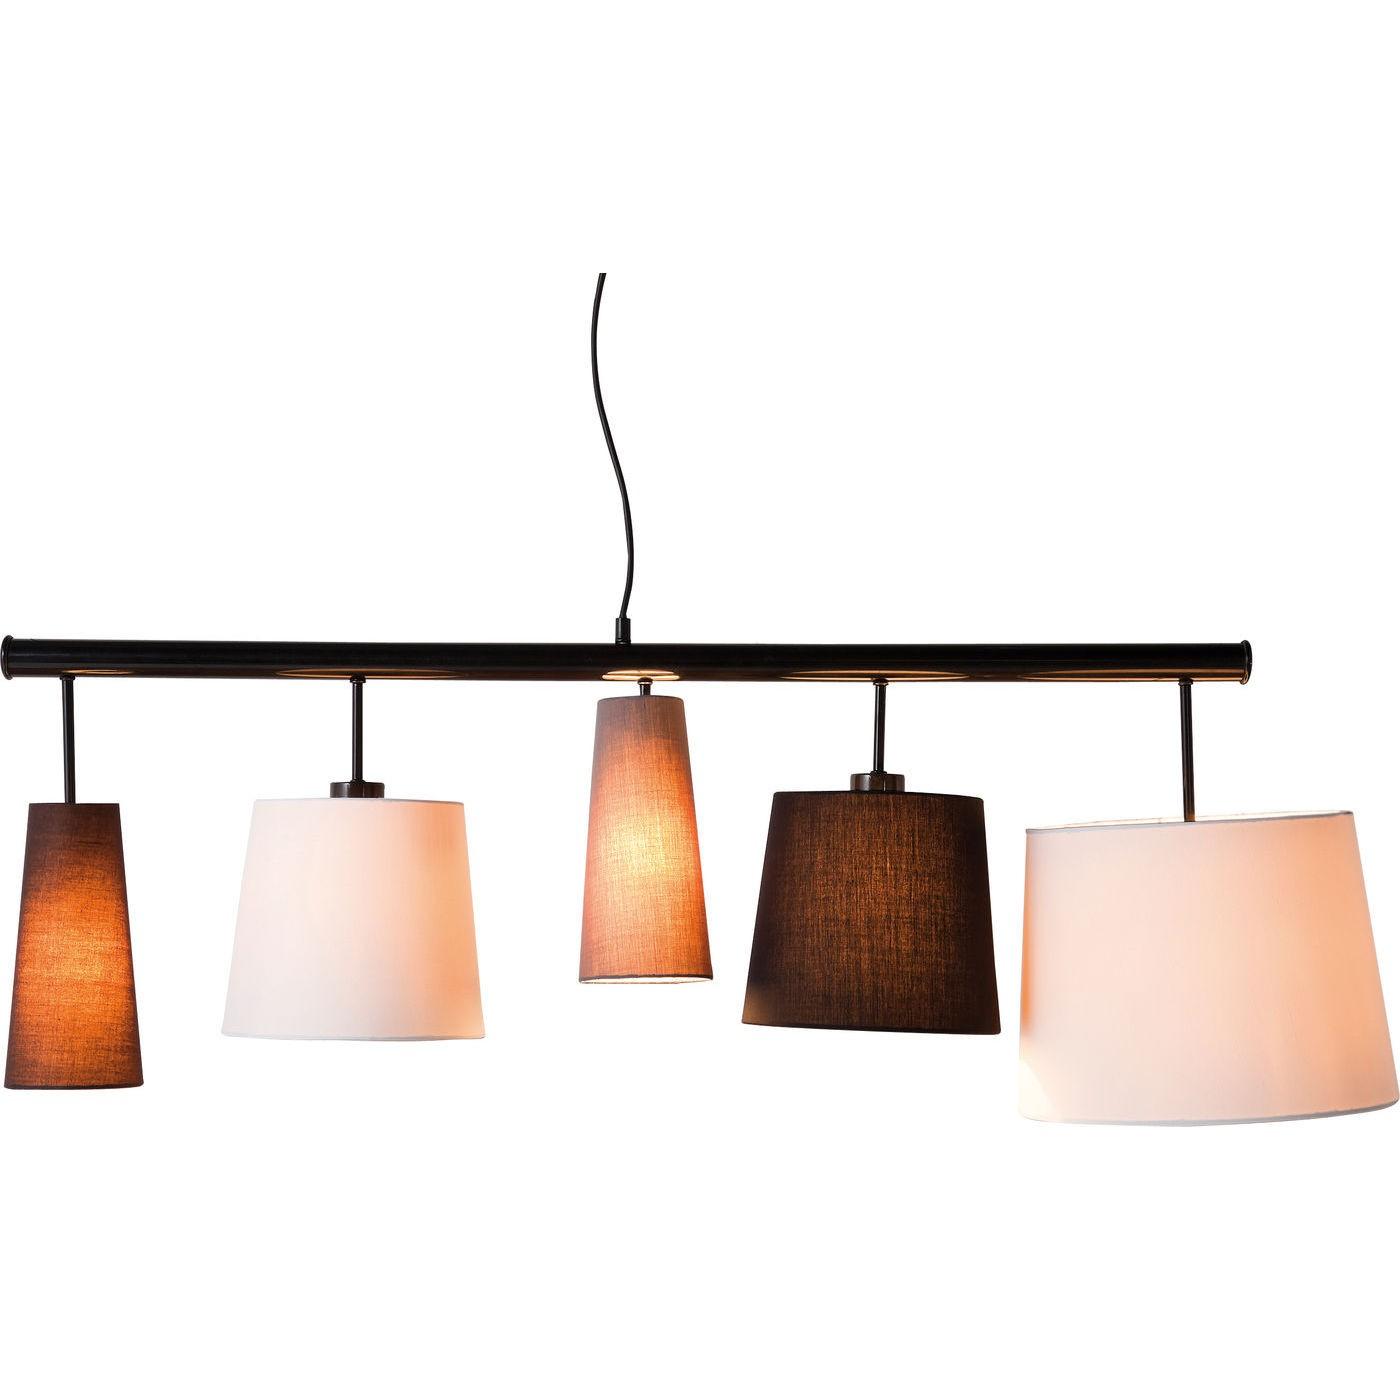 KARE_Lights&Lamps